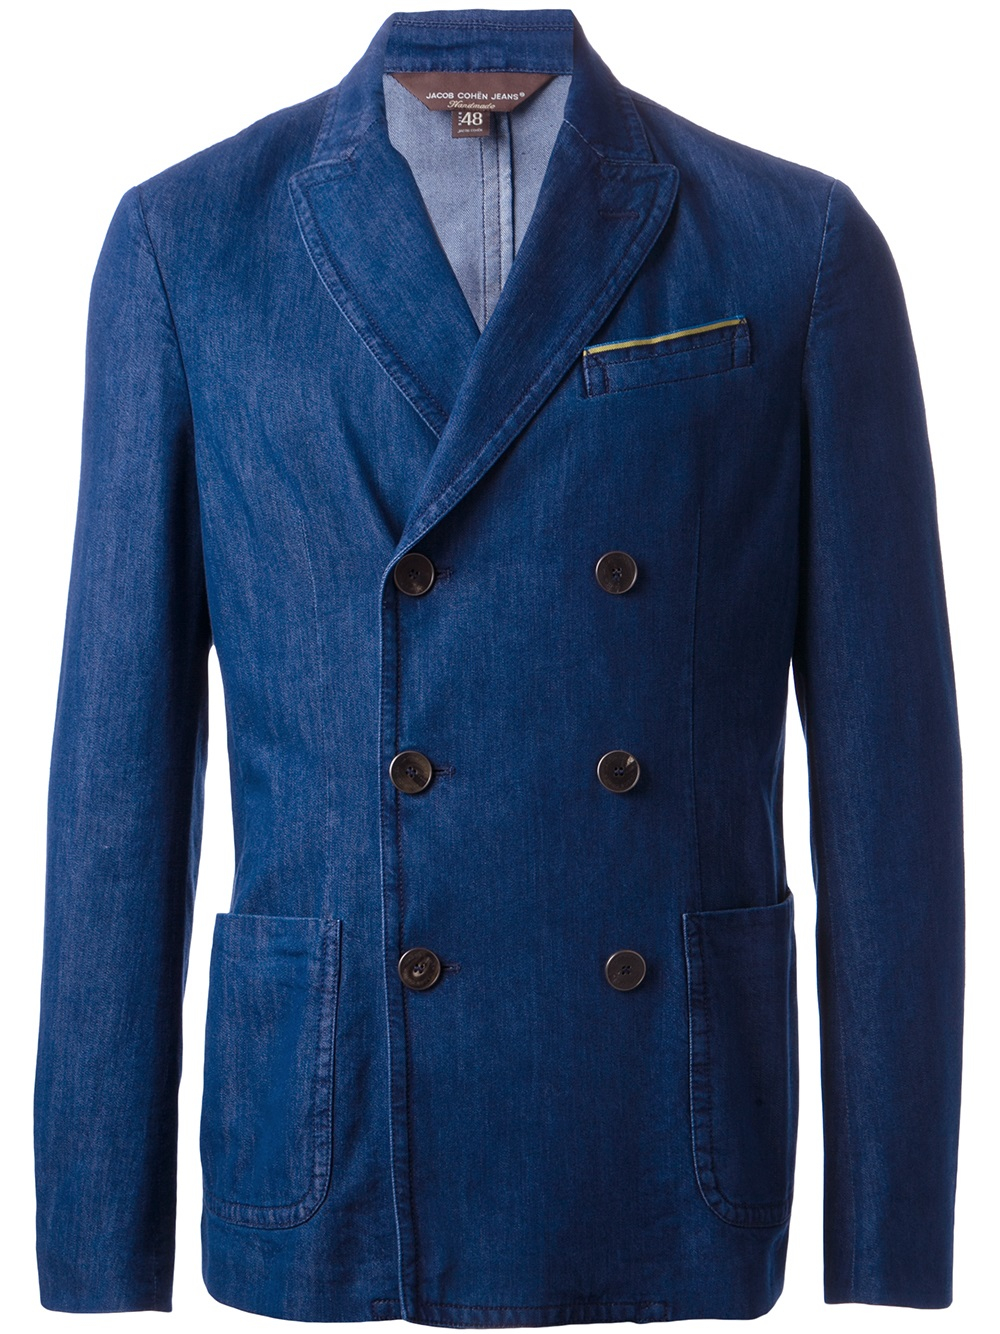 Blazers For Men Pinterest: Jacob Cohen Double Breasted Denim Blazer In Blue